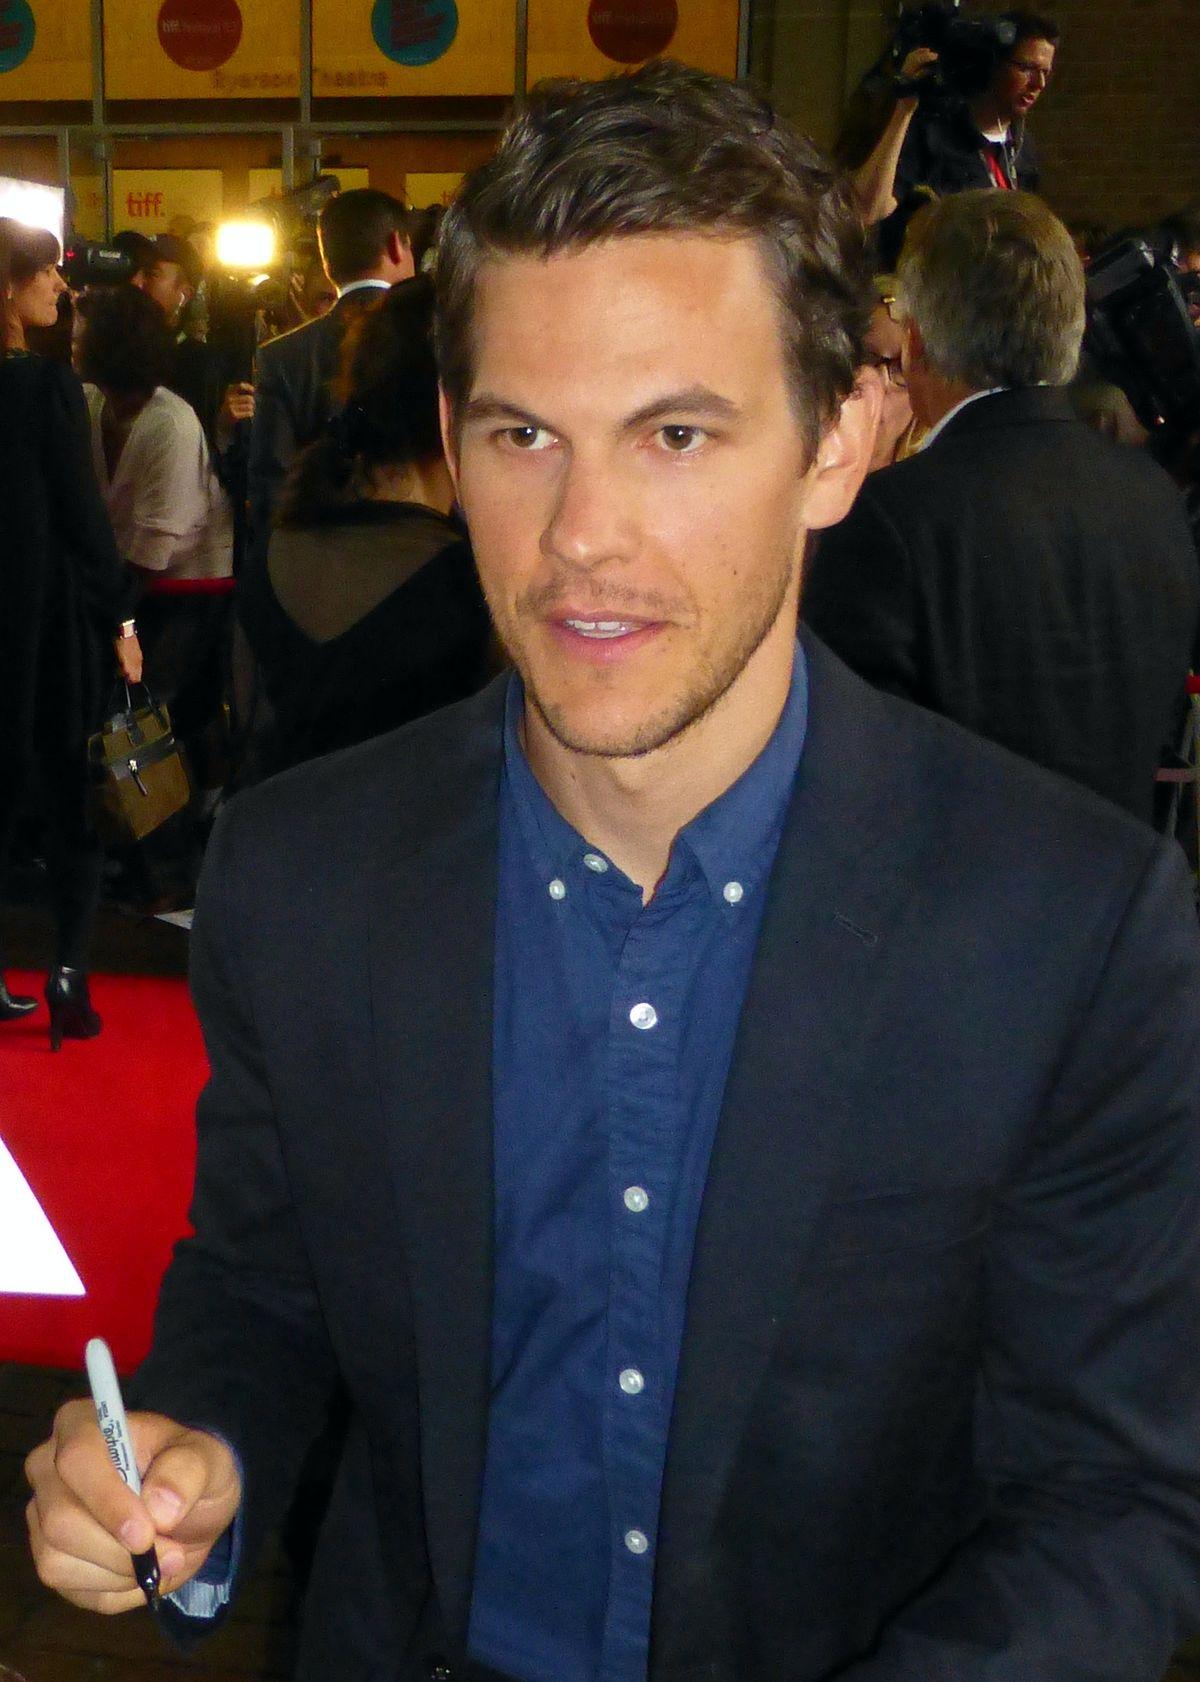 Tom Lipinski is wearing a blue shirt followed by suit